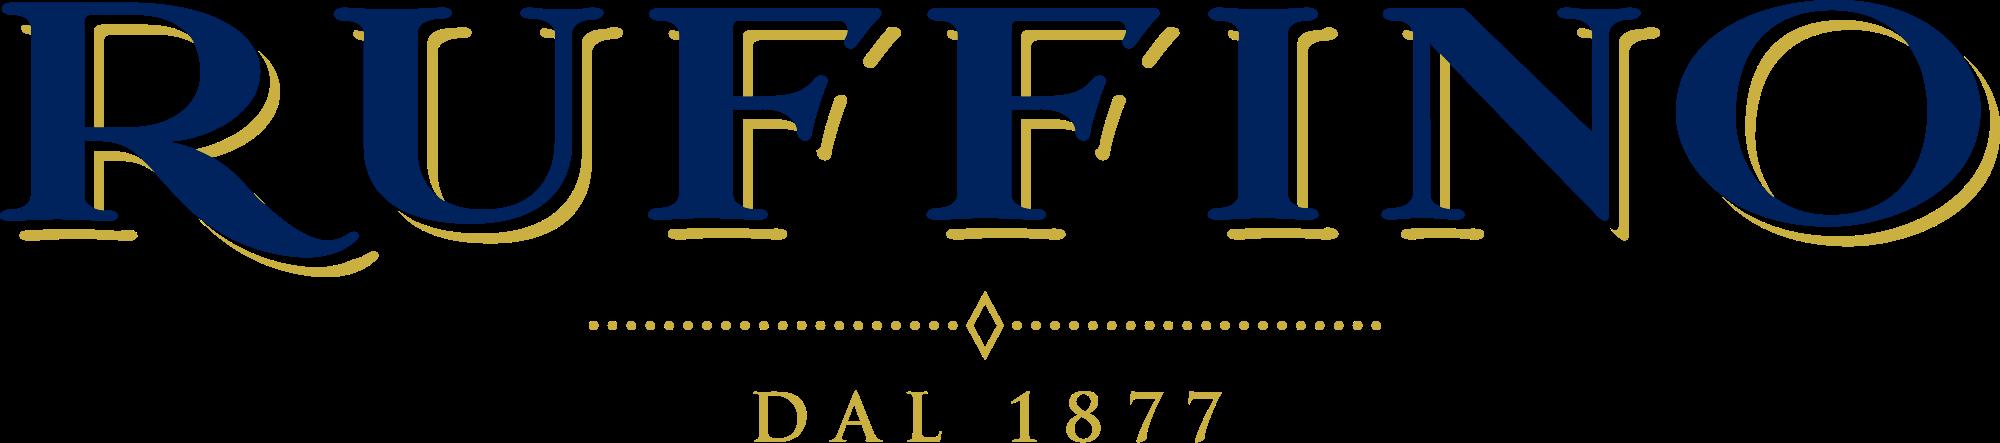 Ruffino logo.png